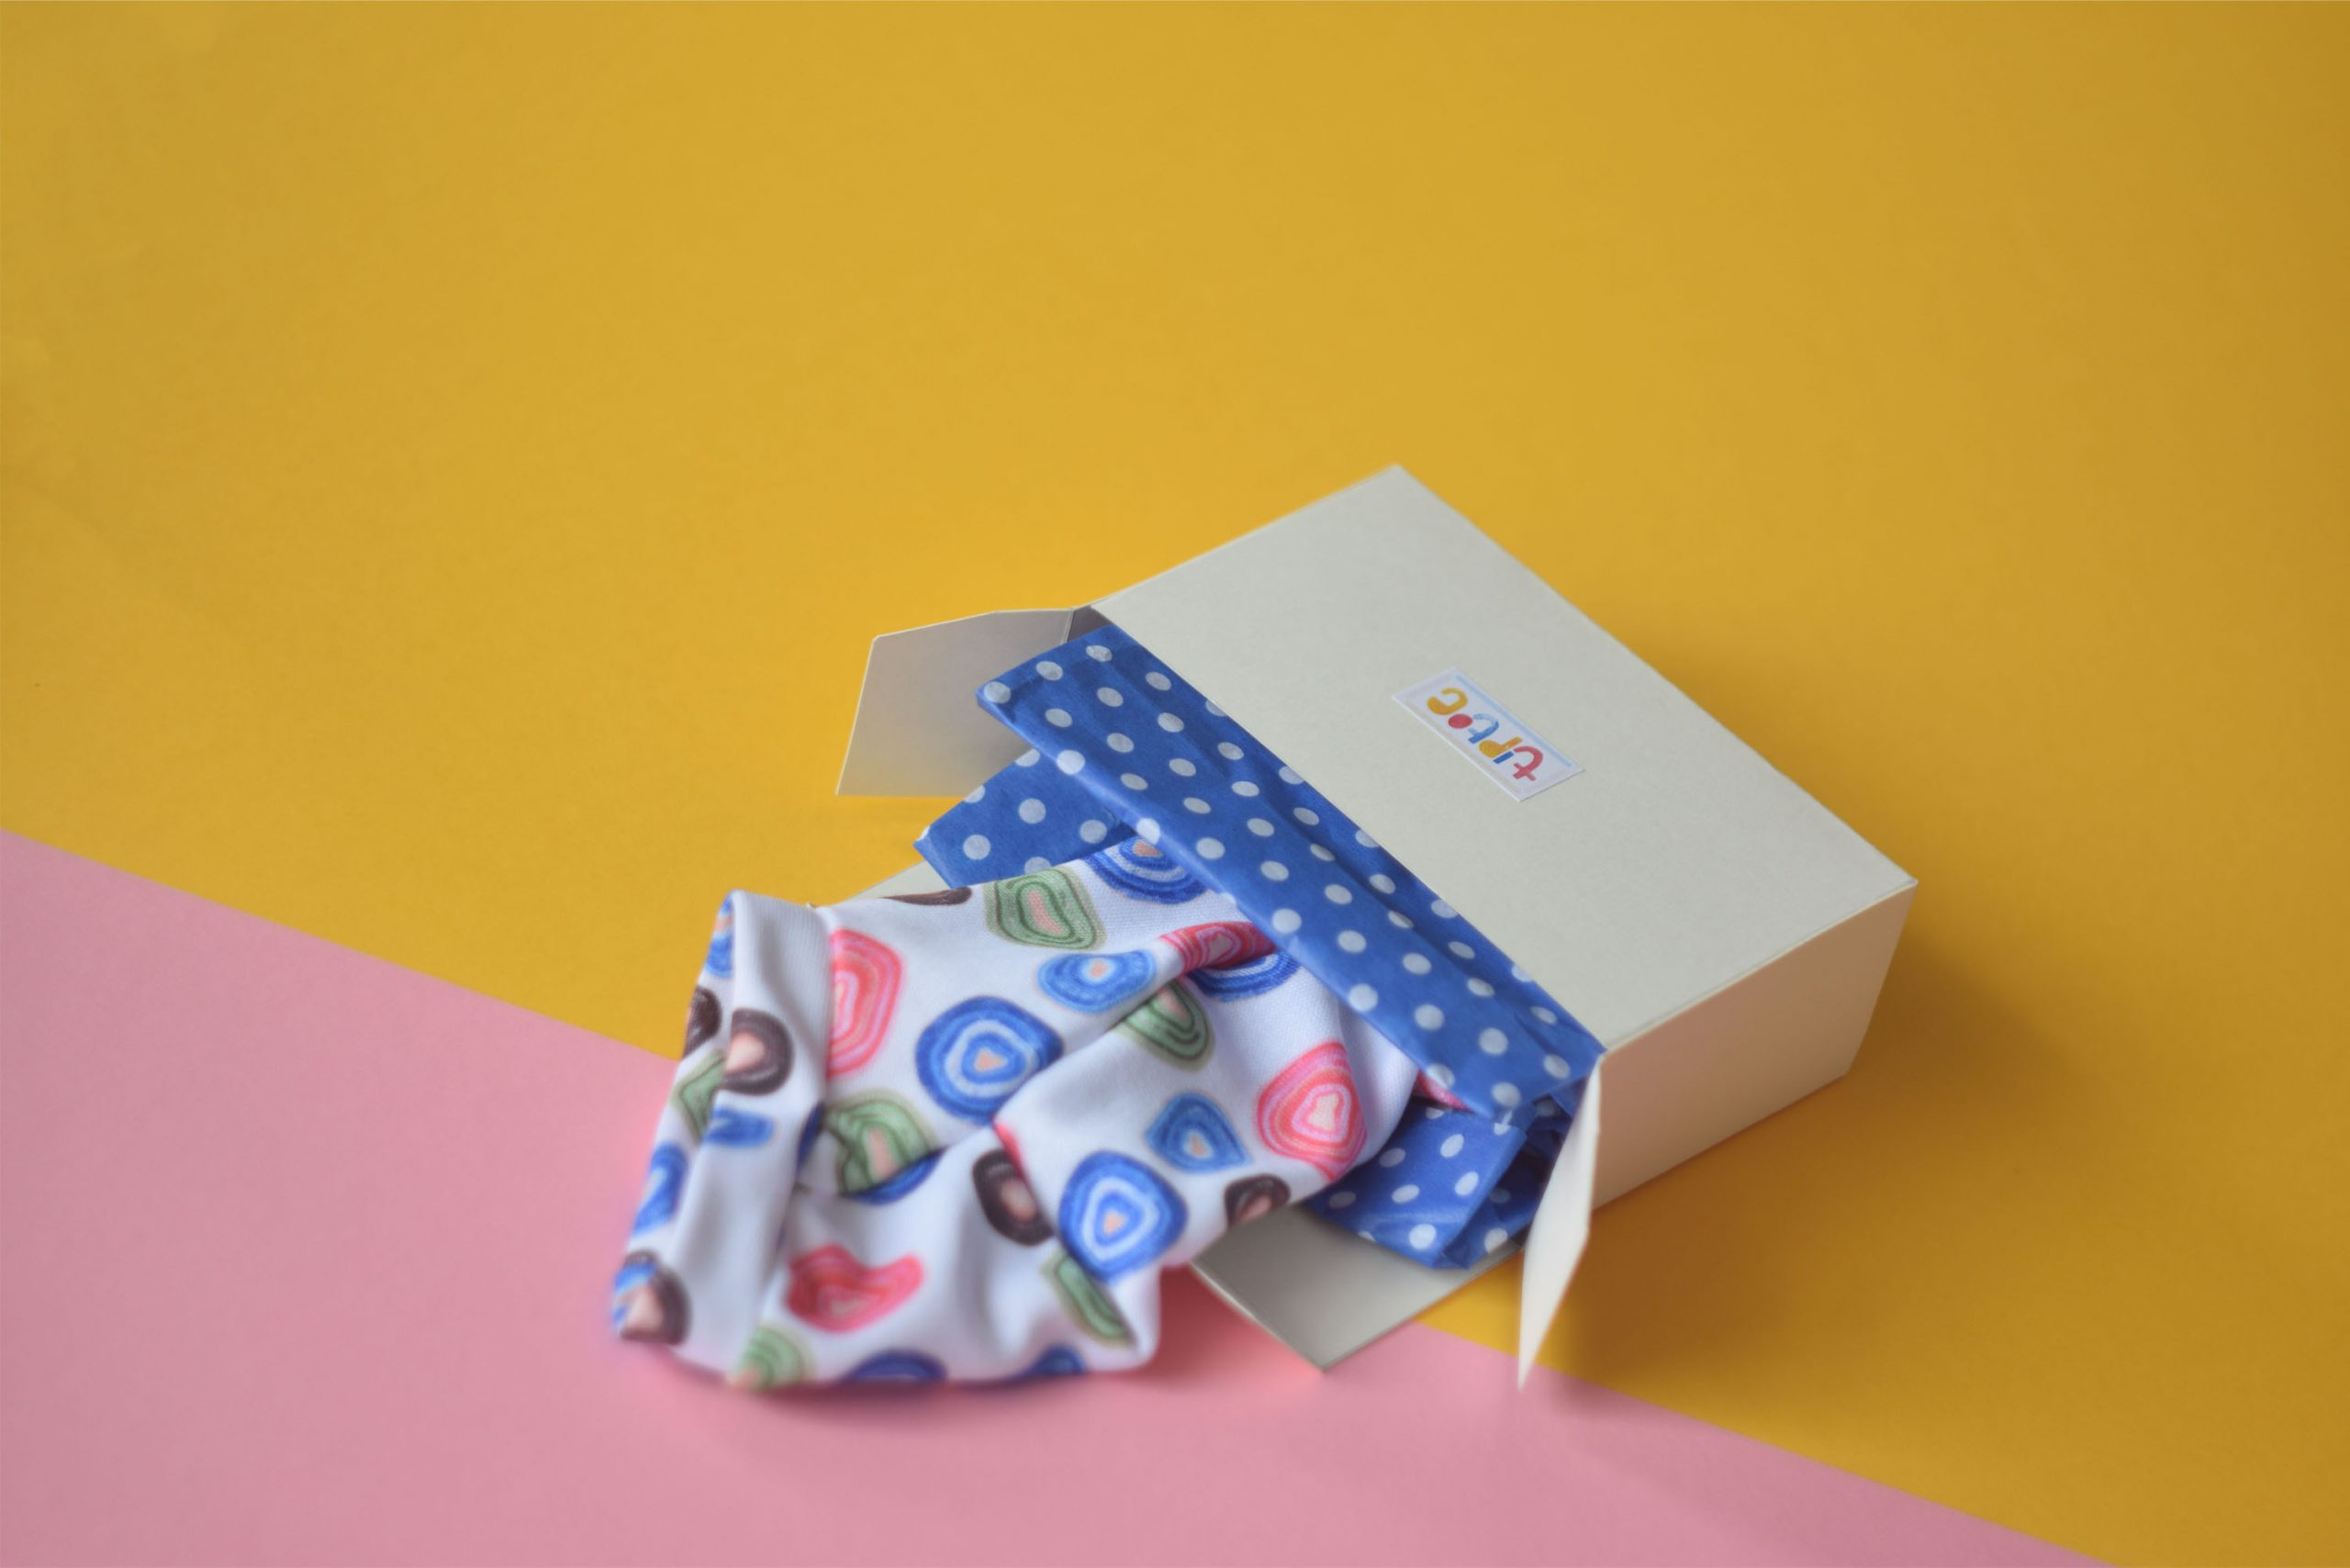 Tiptoe geode socks